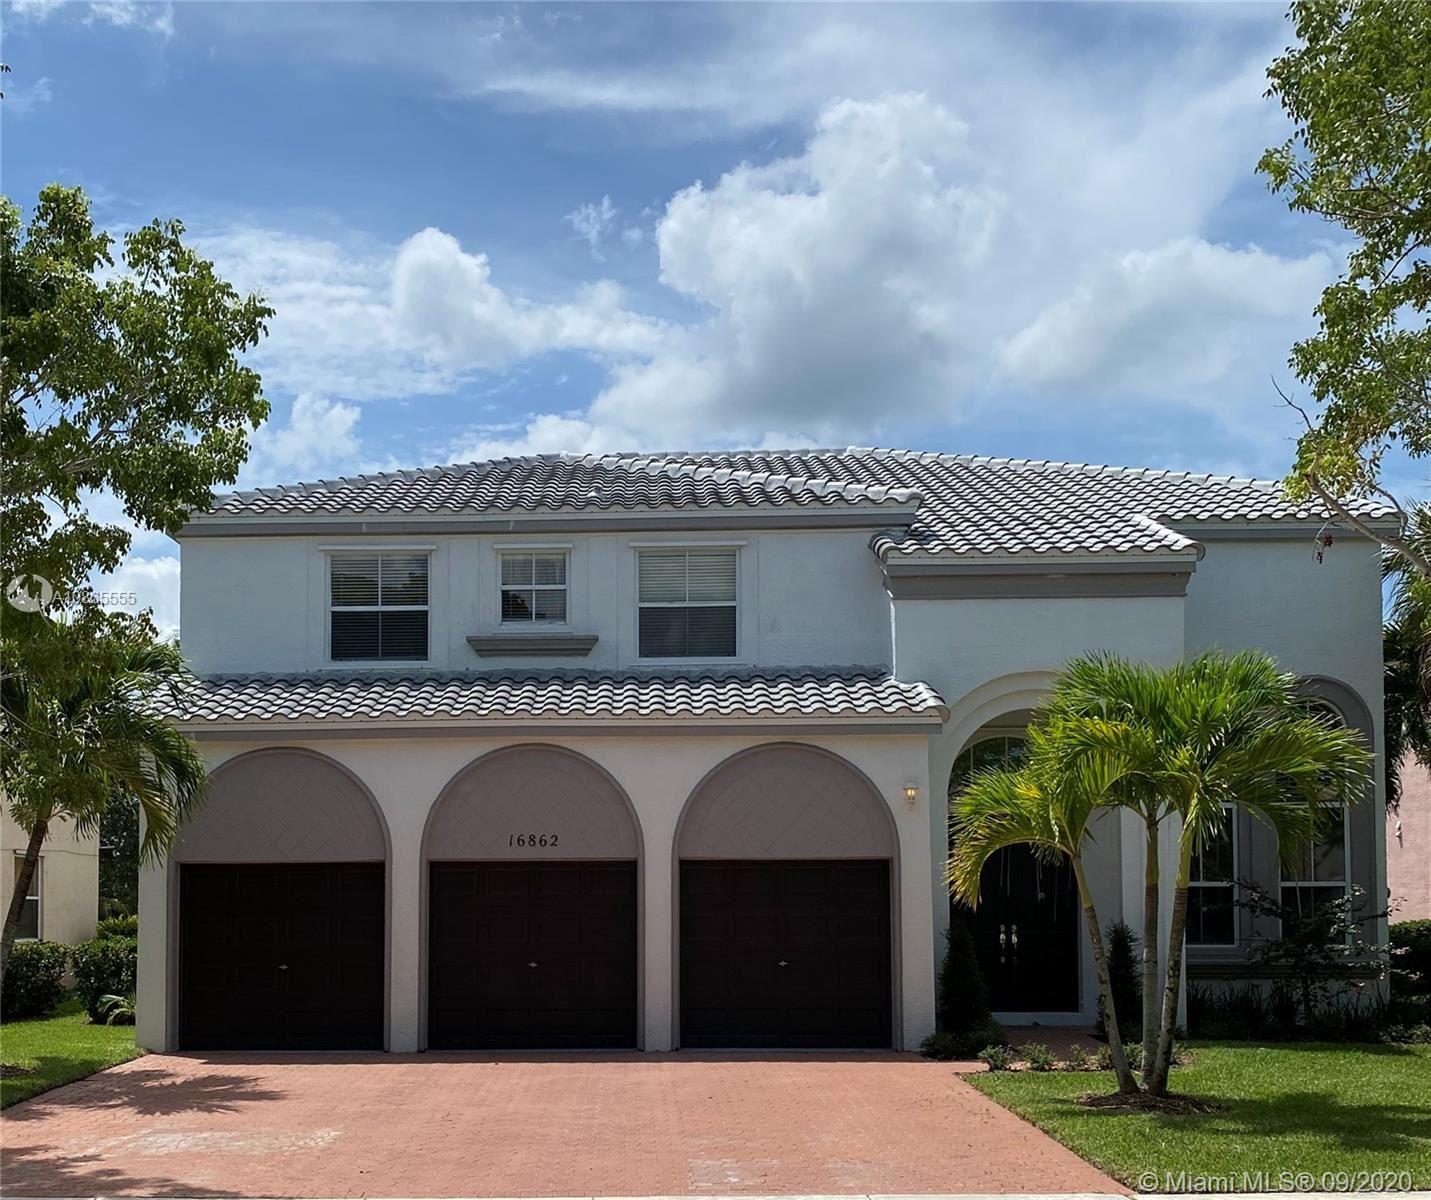 16862 SW 50th Street, Miramar, FL 33027 - #: A10865555